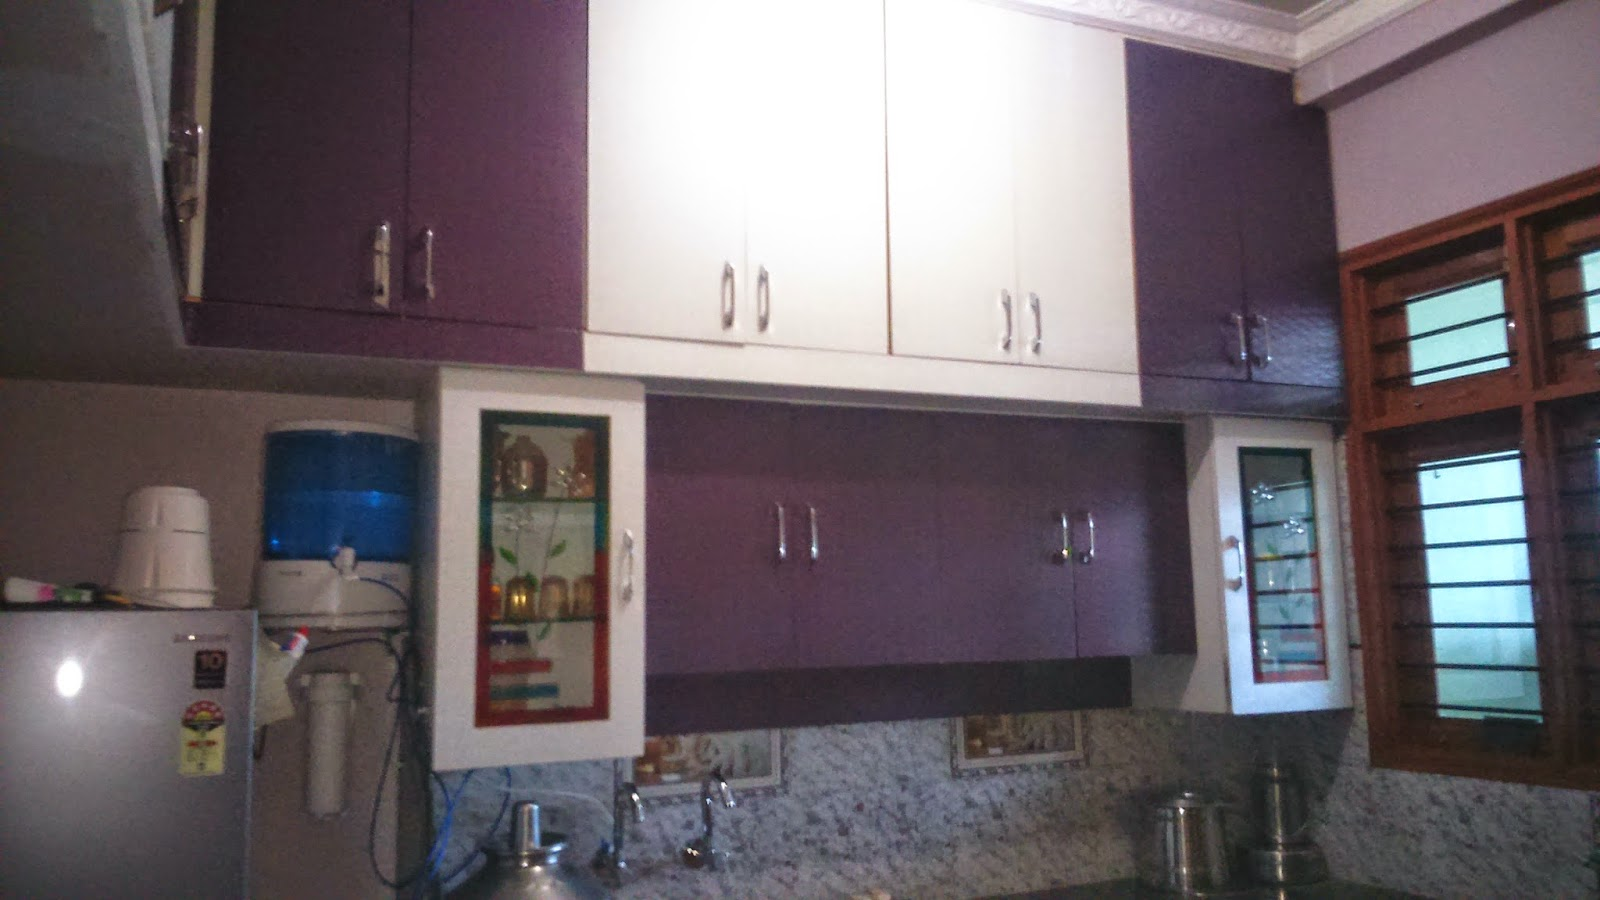 kitchen design purple and white. the new kitchen design combination of white and din grey purple and white